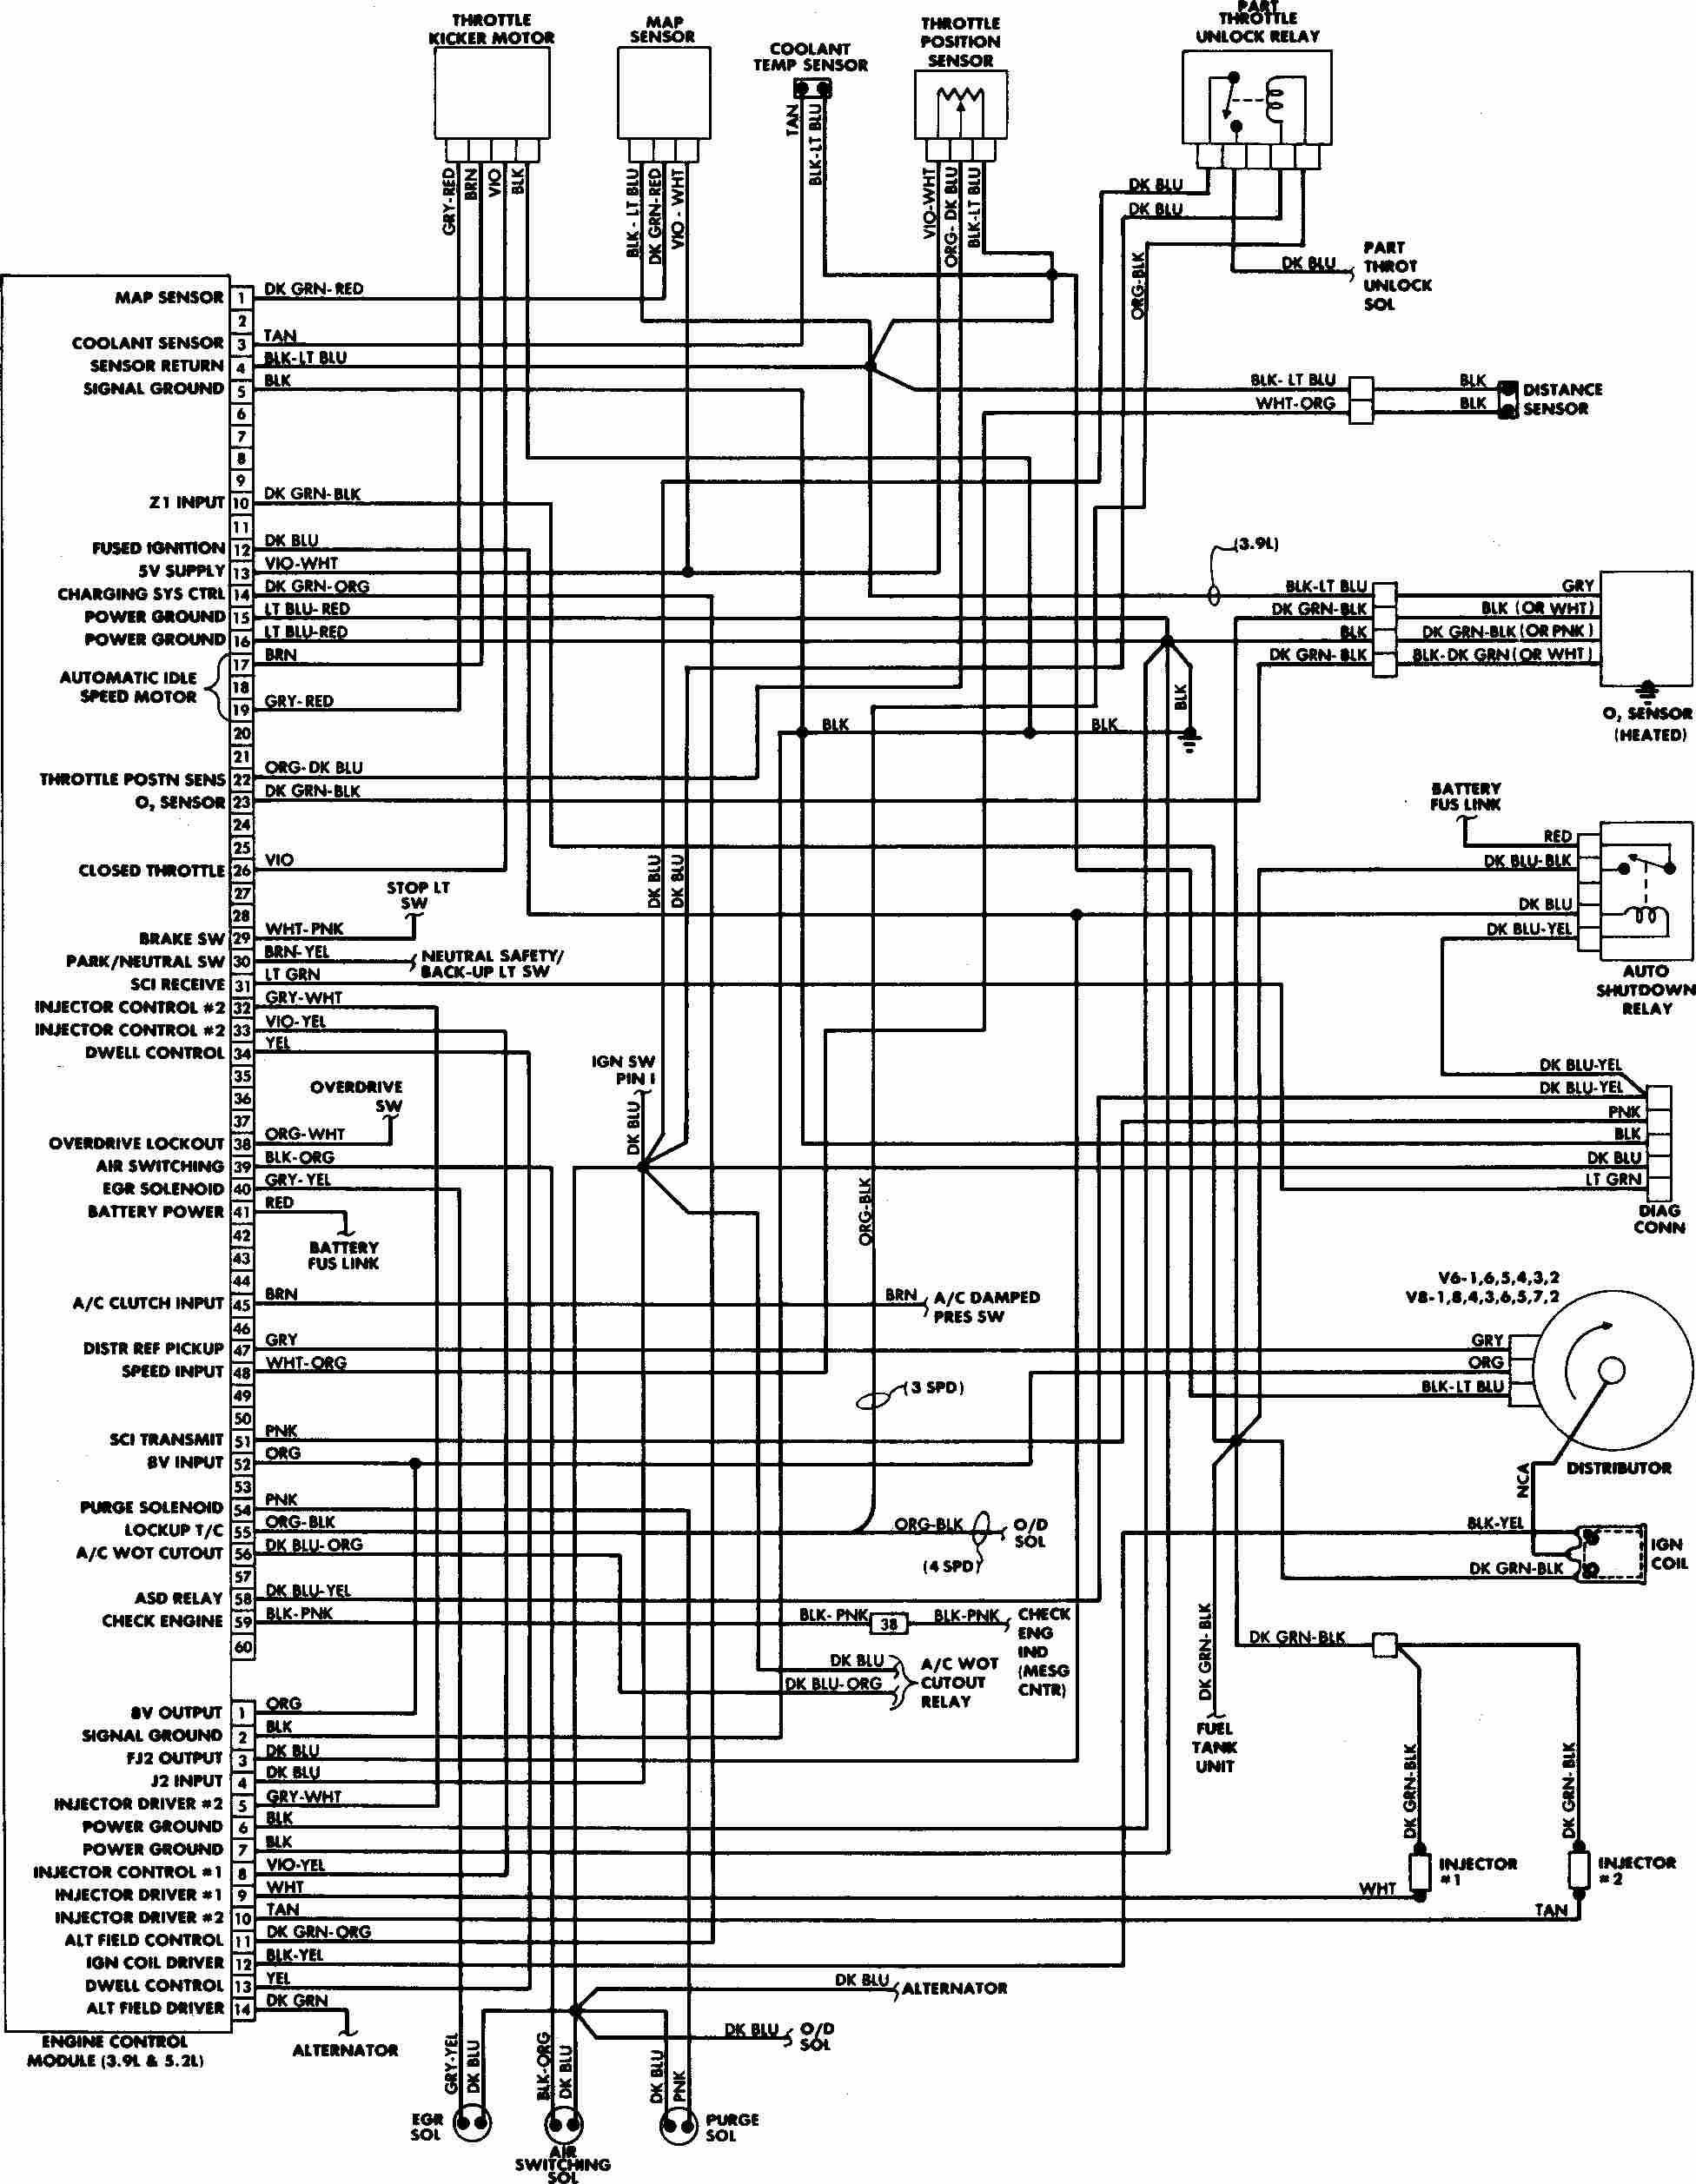 1995 Dodge Ram 1500 Transmission Wiring Diagram Fresh 2003 Dodge Ram 1500 Engine Diagram 2014 Cummins